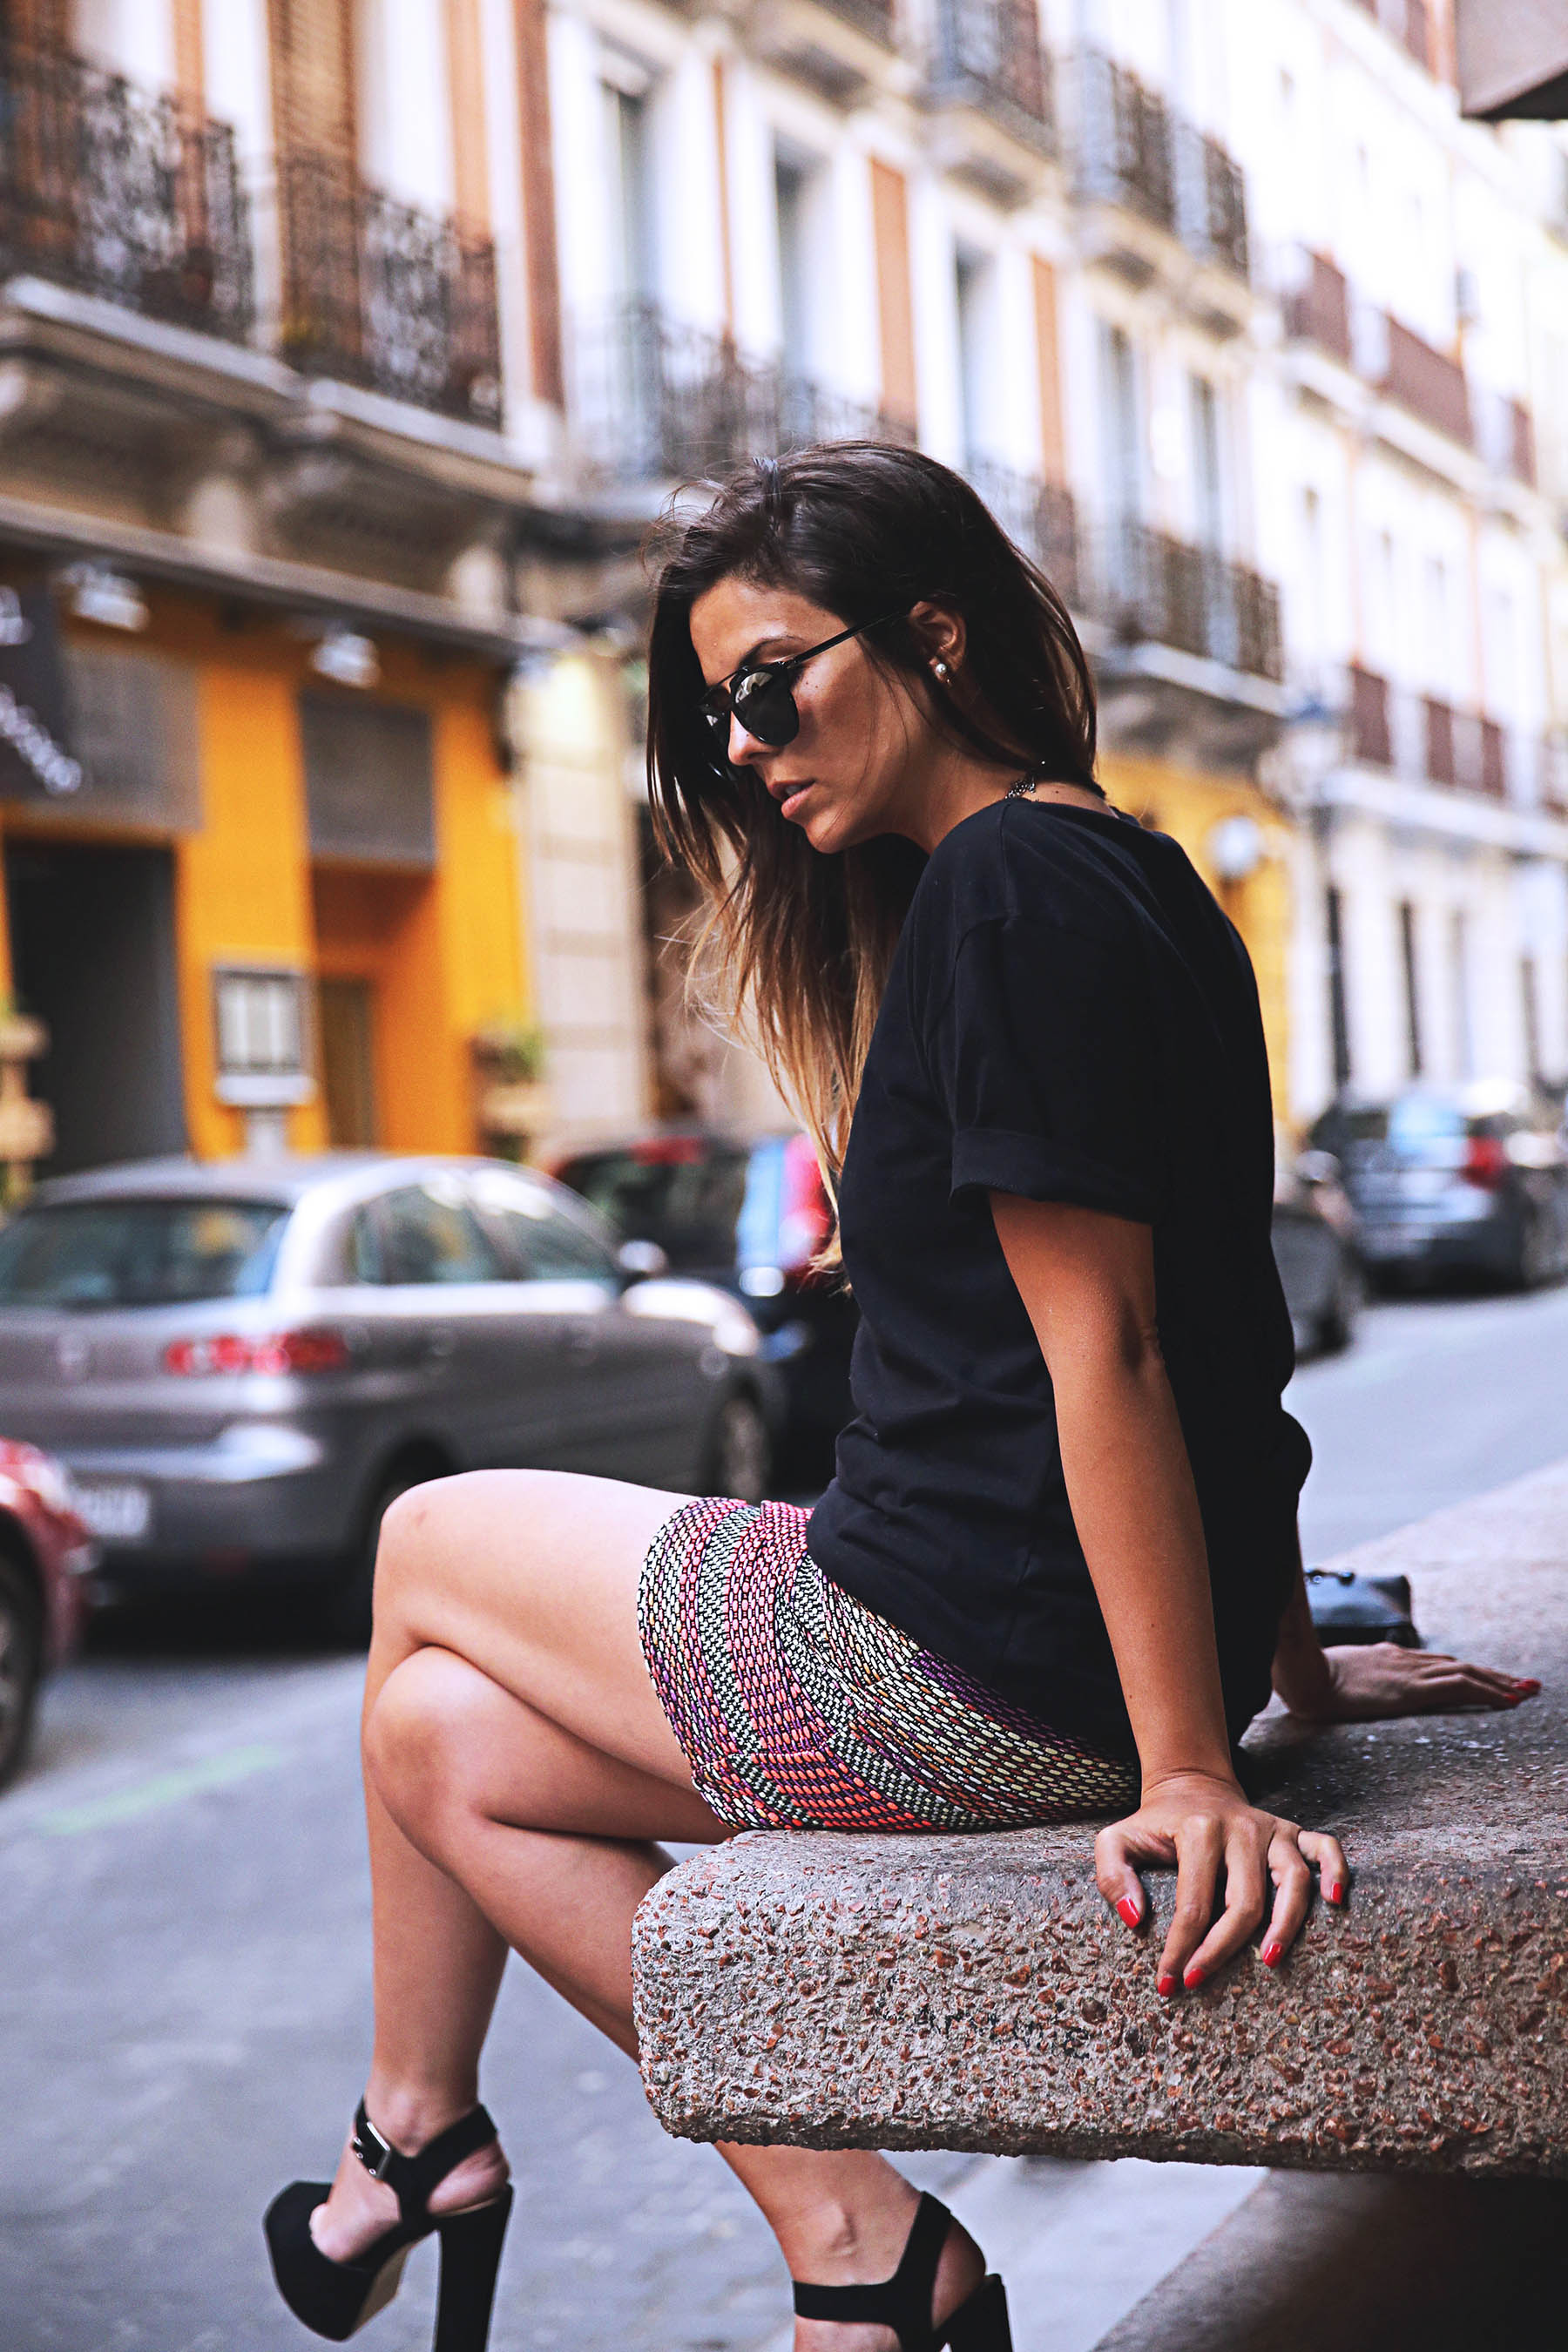 trendy-taste-look-outfit-street-style-ootd-blog-blogger-fashion-spain-moda-españa-falda-etnica-ethnic-print-skirt-steve-madden-basic-tee-dior-black-negro-2